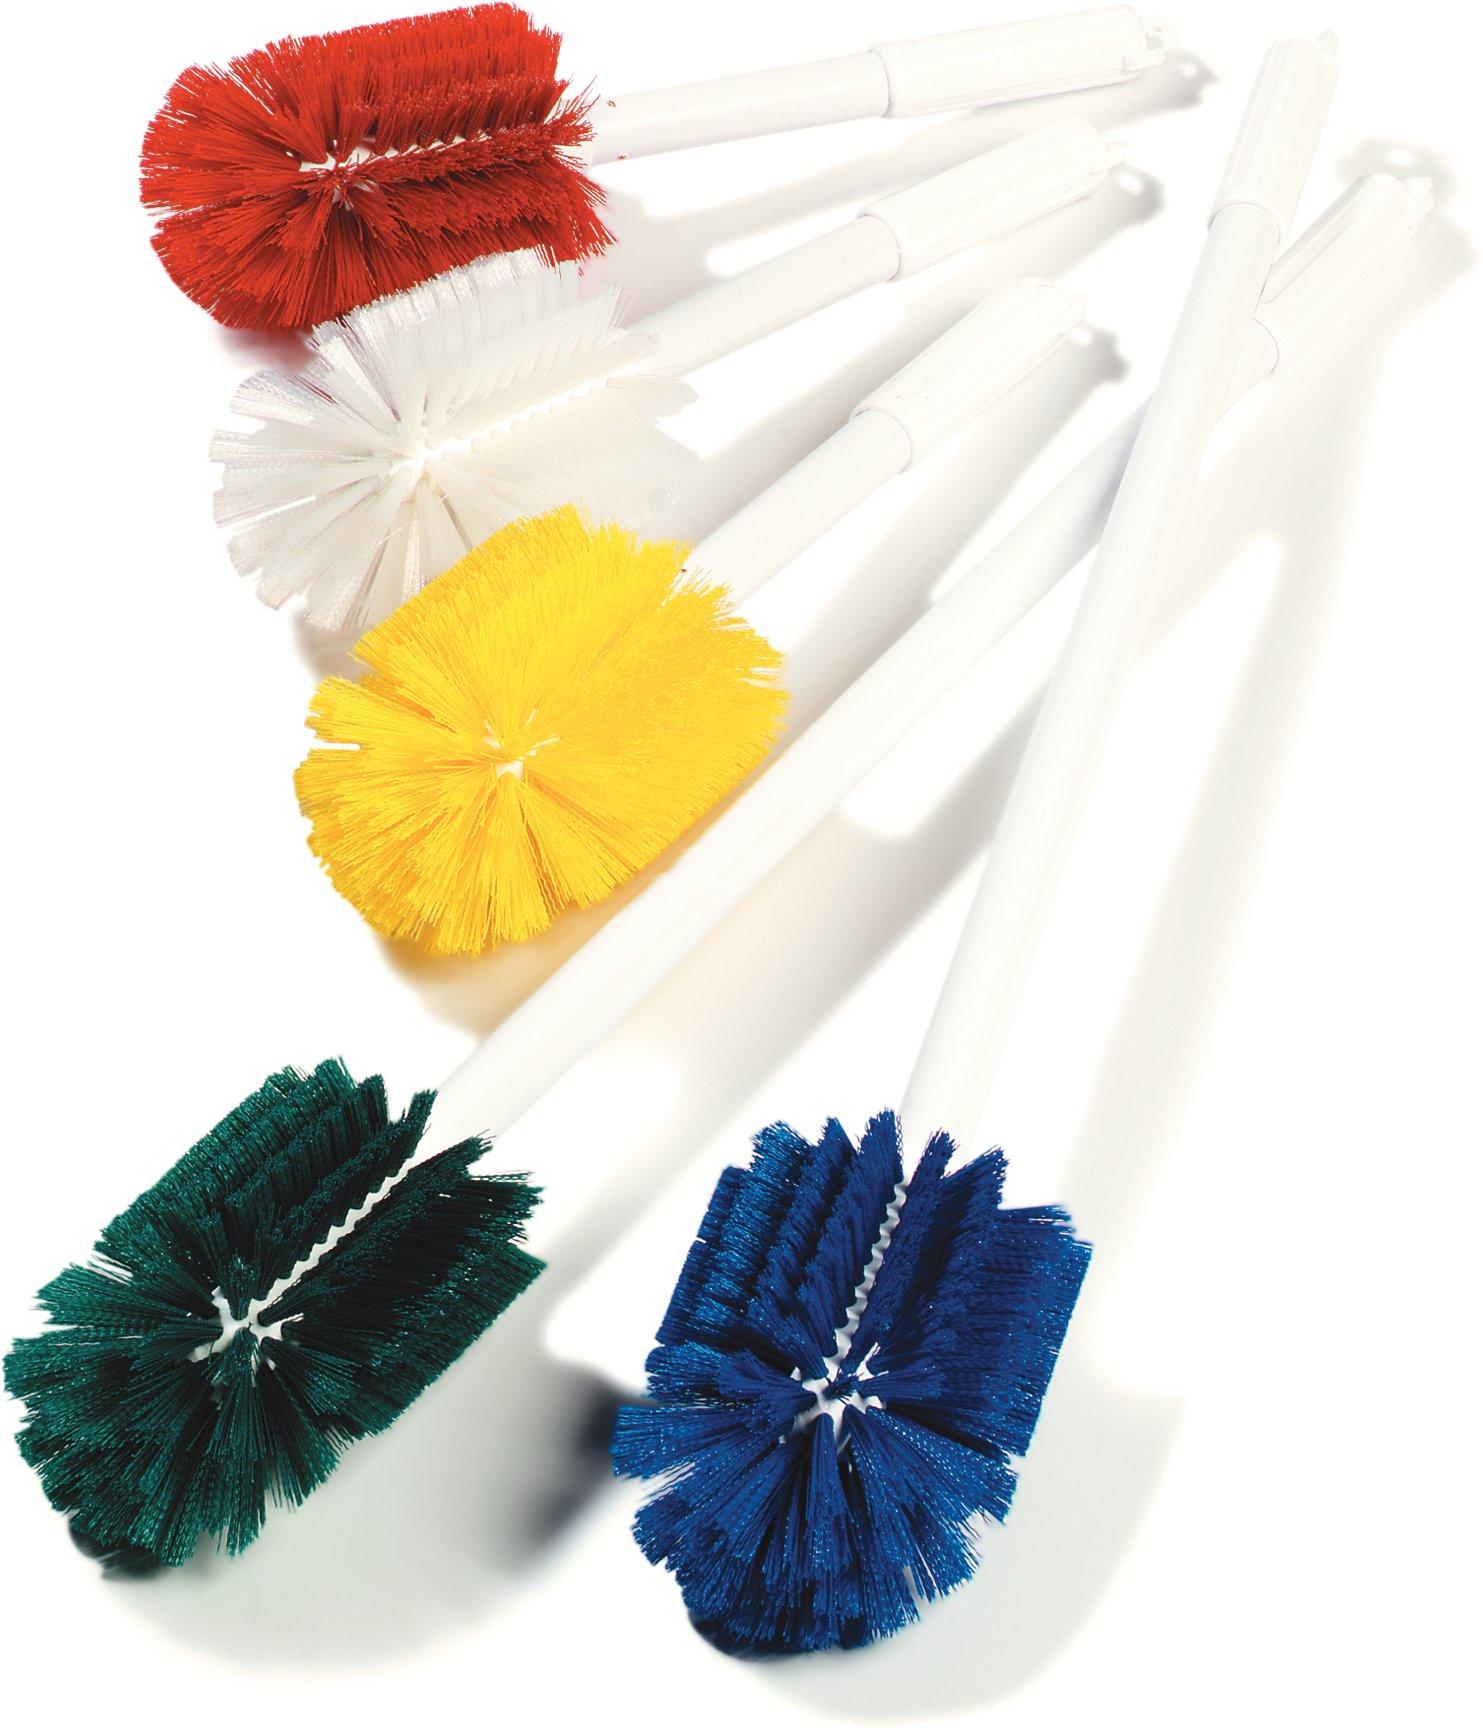 Carlisle 4000309 Multi-Purpose Oval Valve Brush, 3.5'' x 5'' Polyester Bristles, 30'' Length, Green by Carlisle (Image #7)